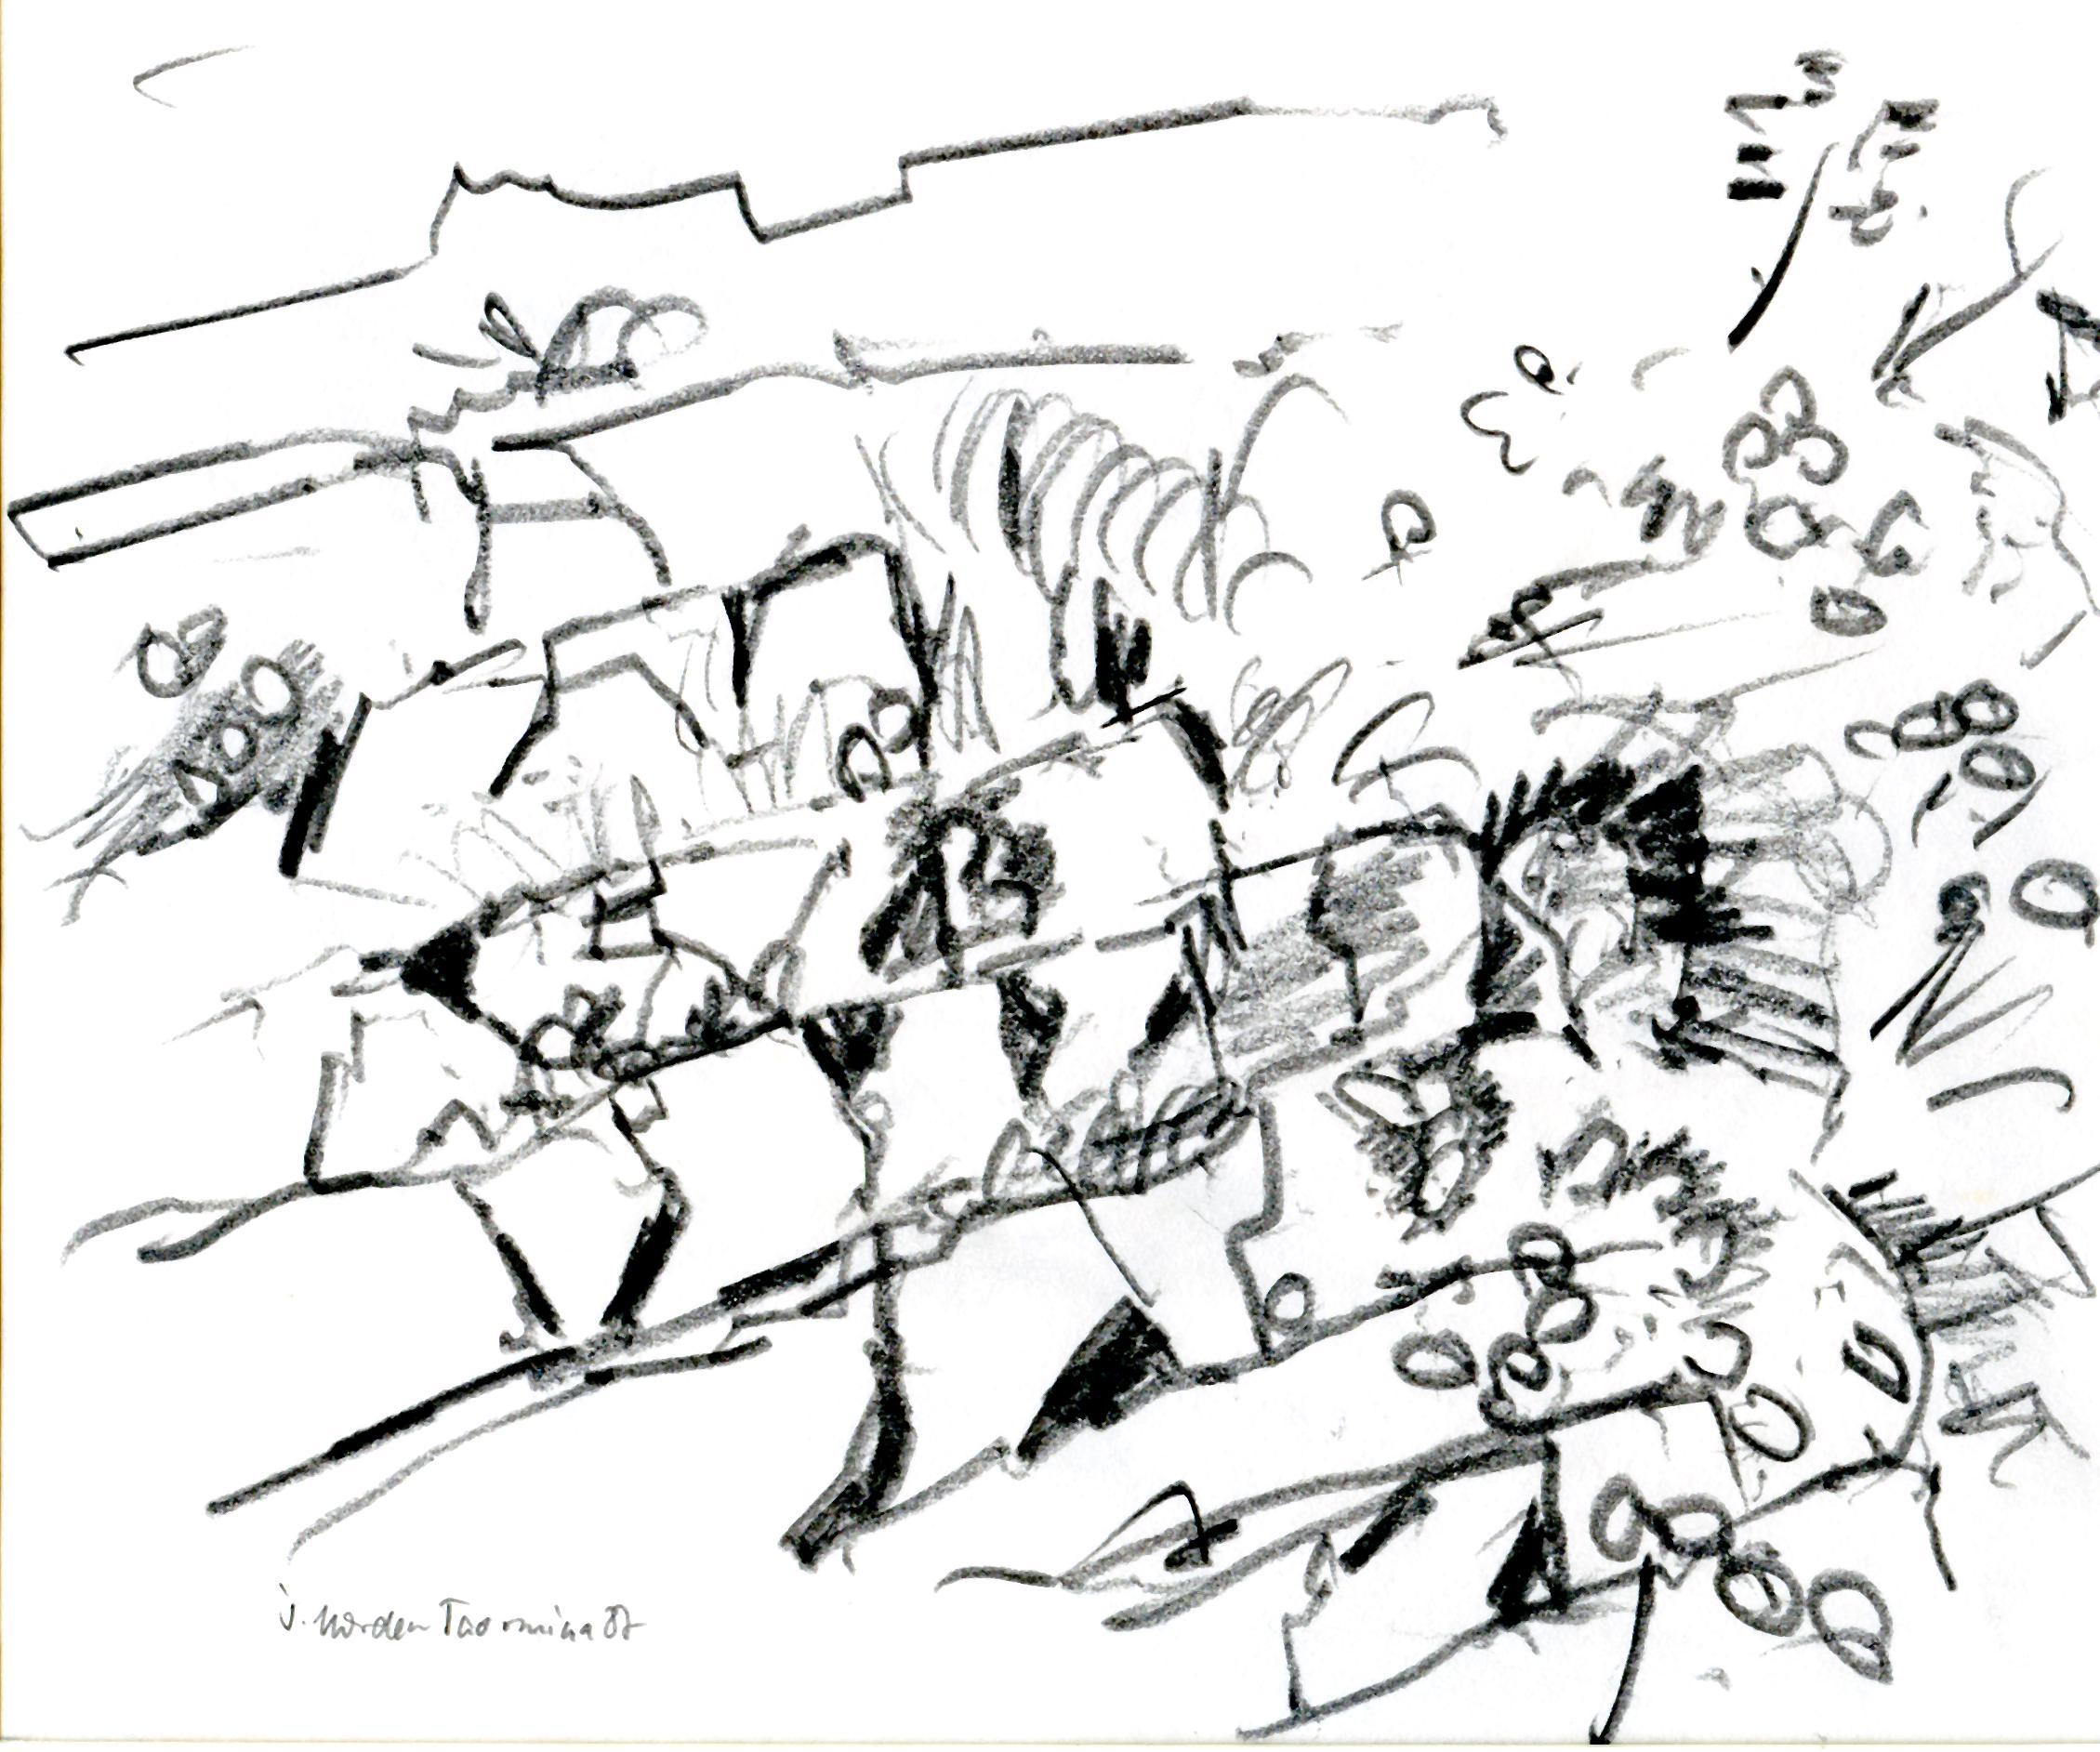 Am Hang über Taormina. Bleistift. 1987